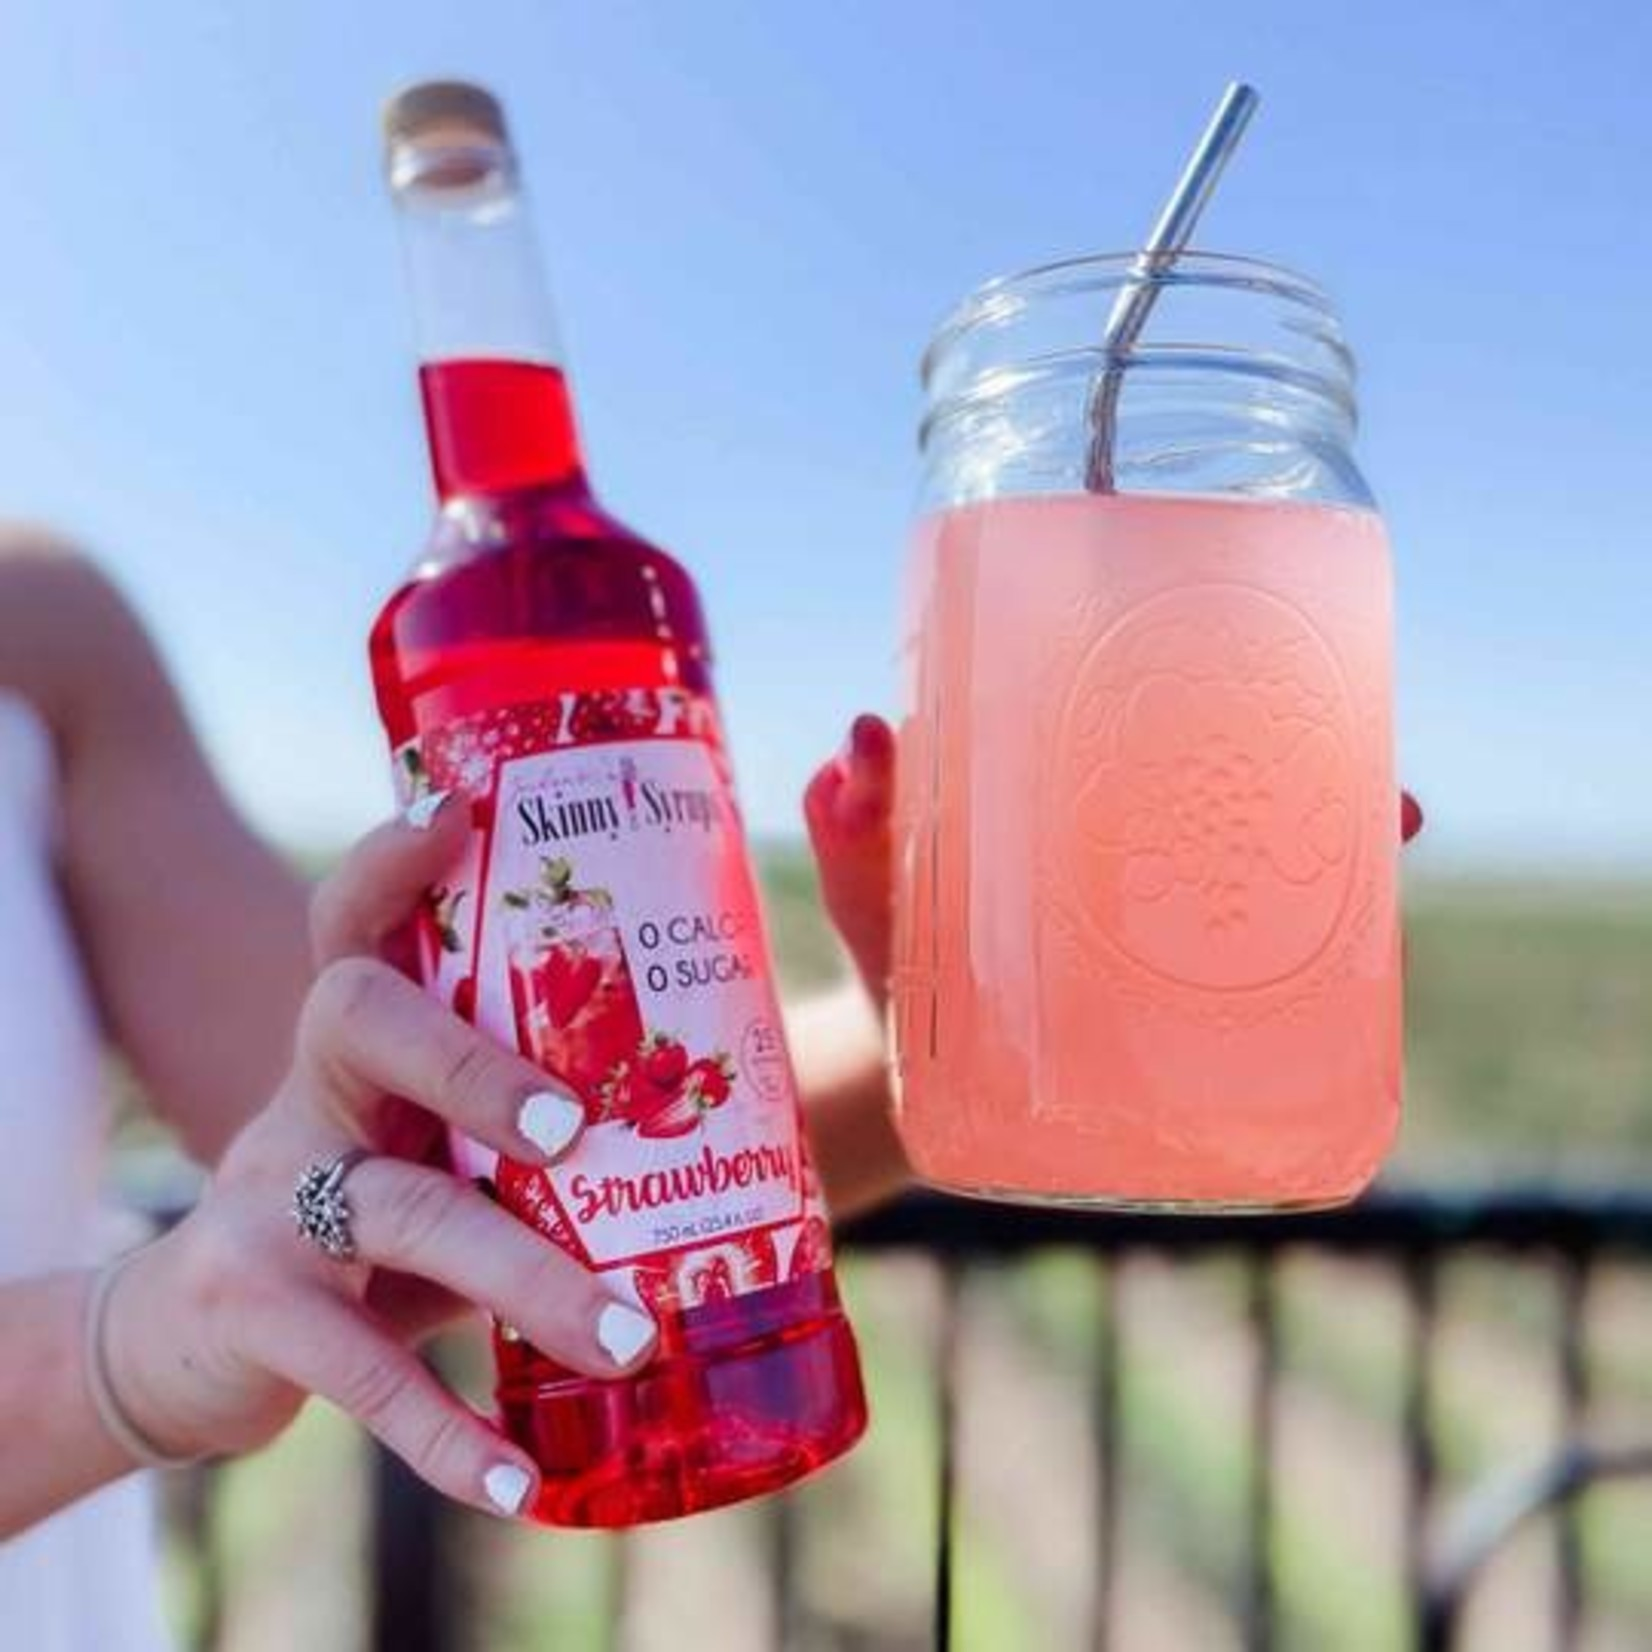 Jordan's Skinny Mixes Sugar Free Strawberry Syrup